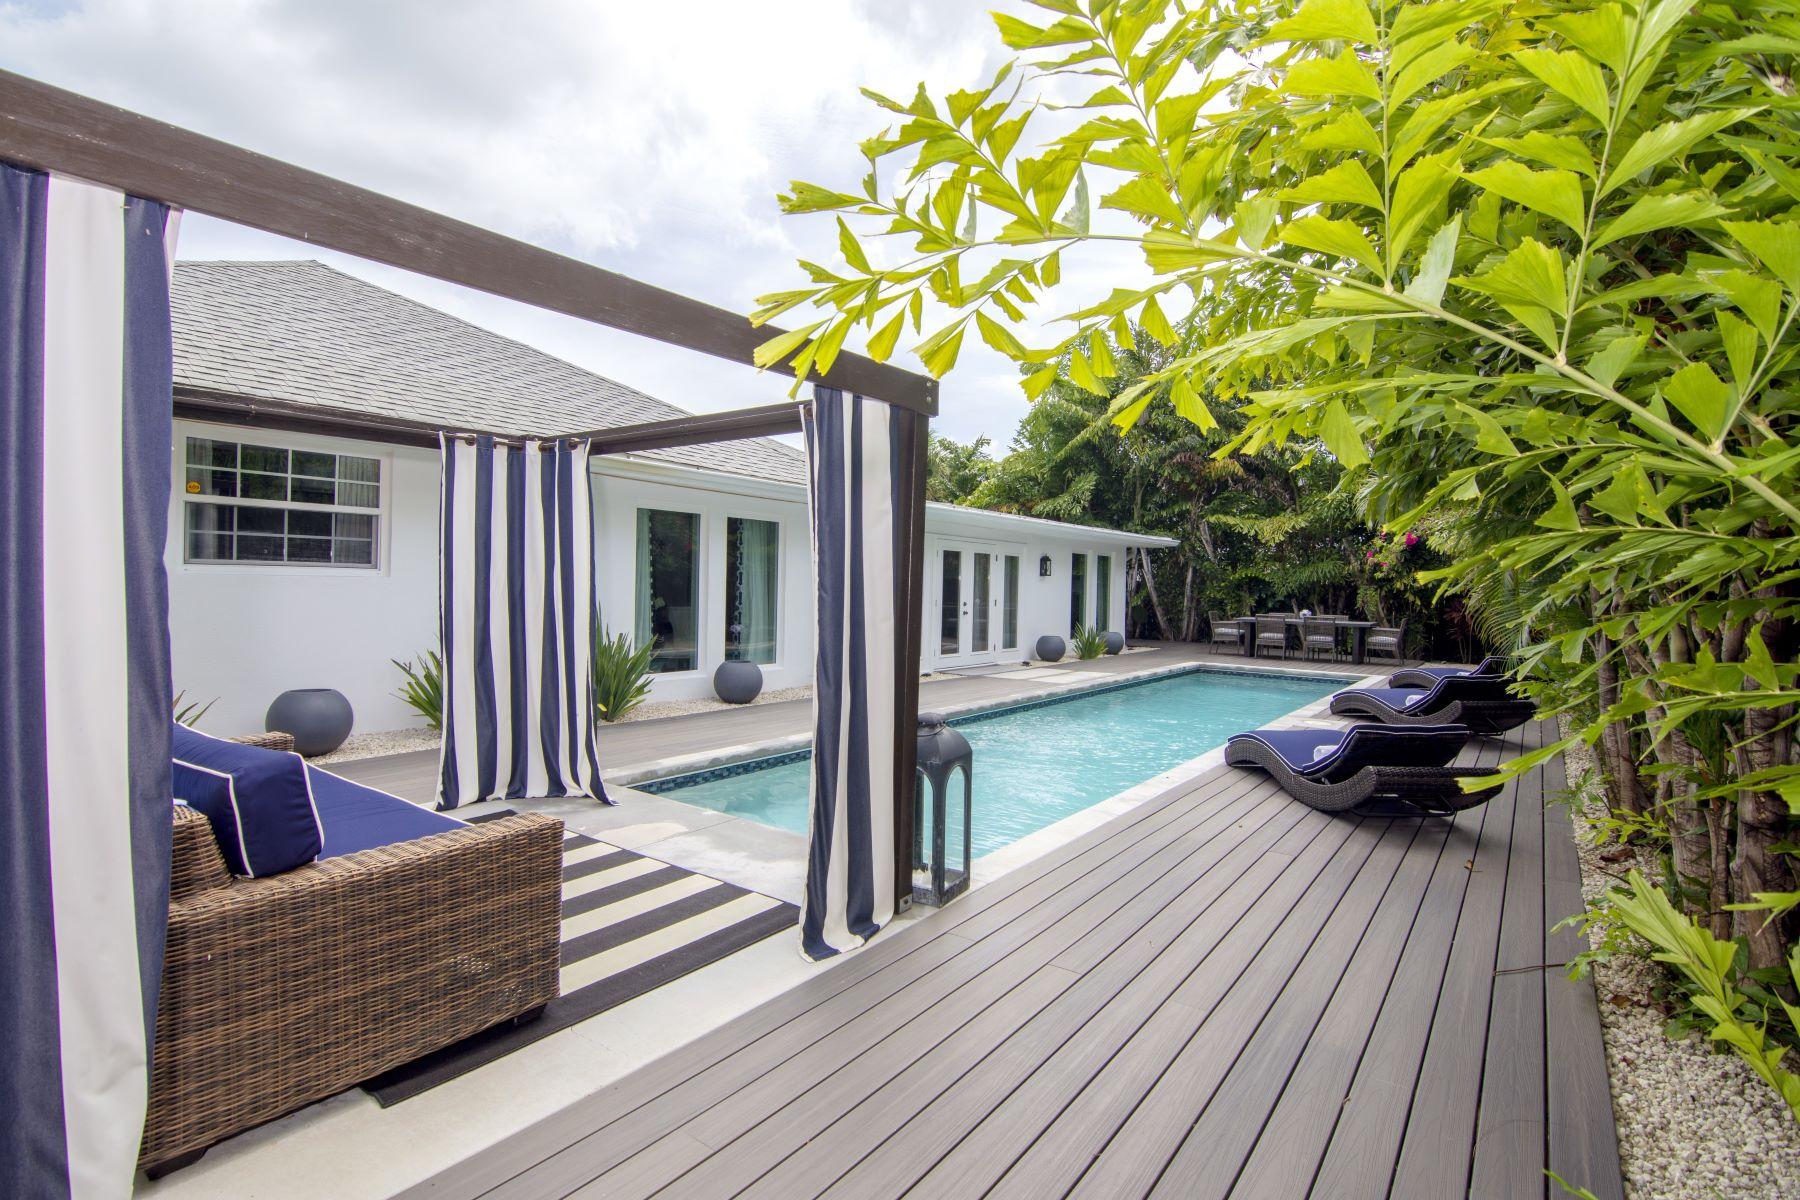 Property for Sale at 600 Honeysuckle Lane Vero Beach, Florida 32963 United States